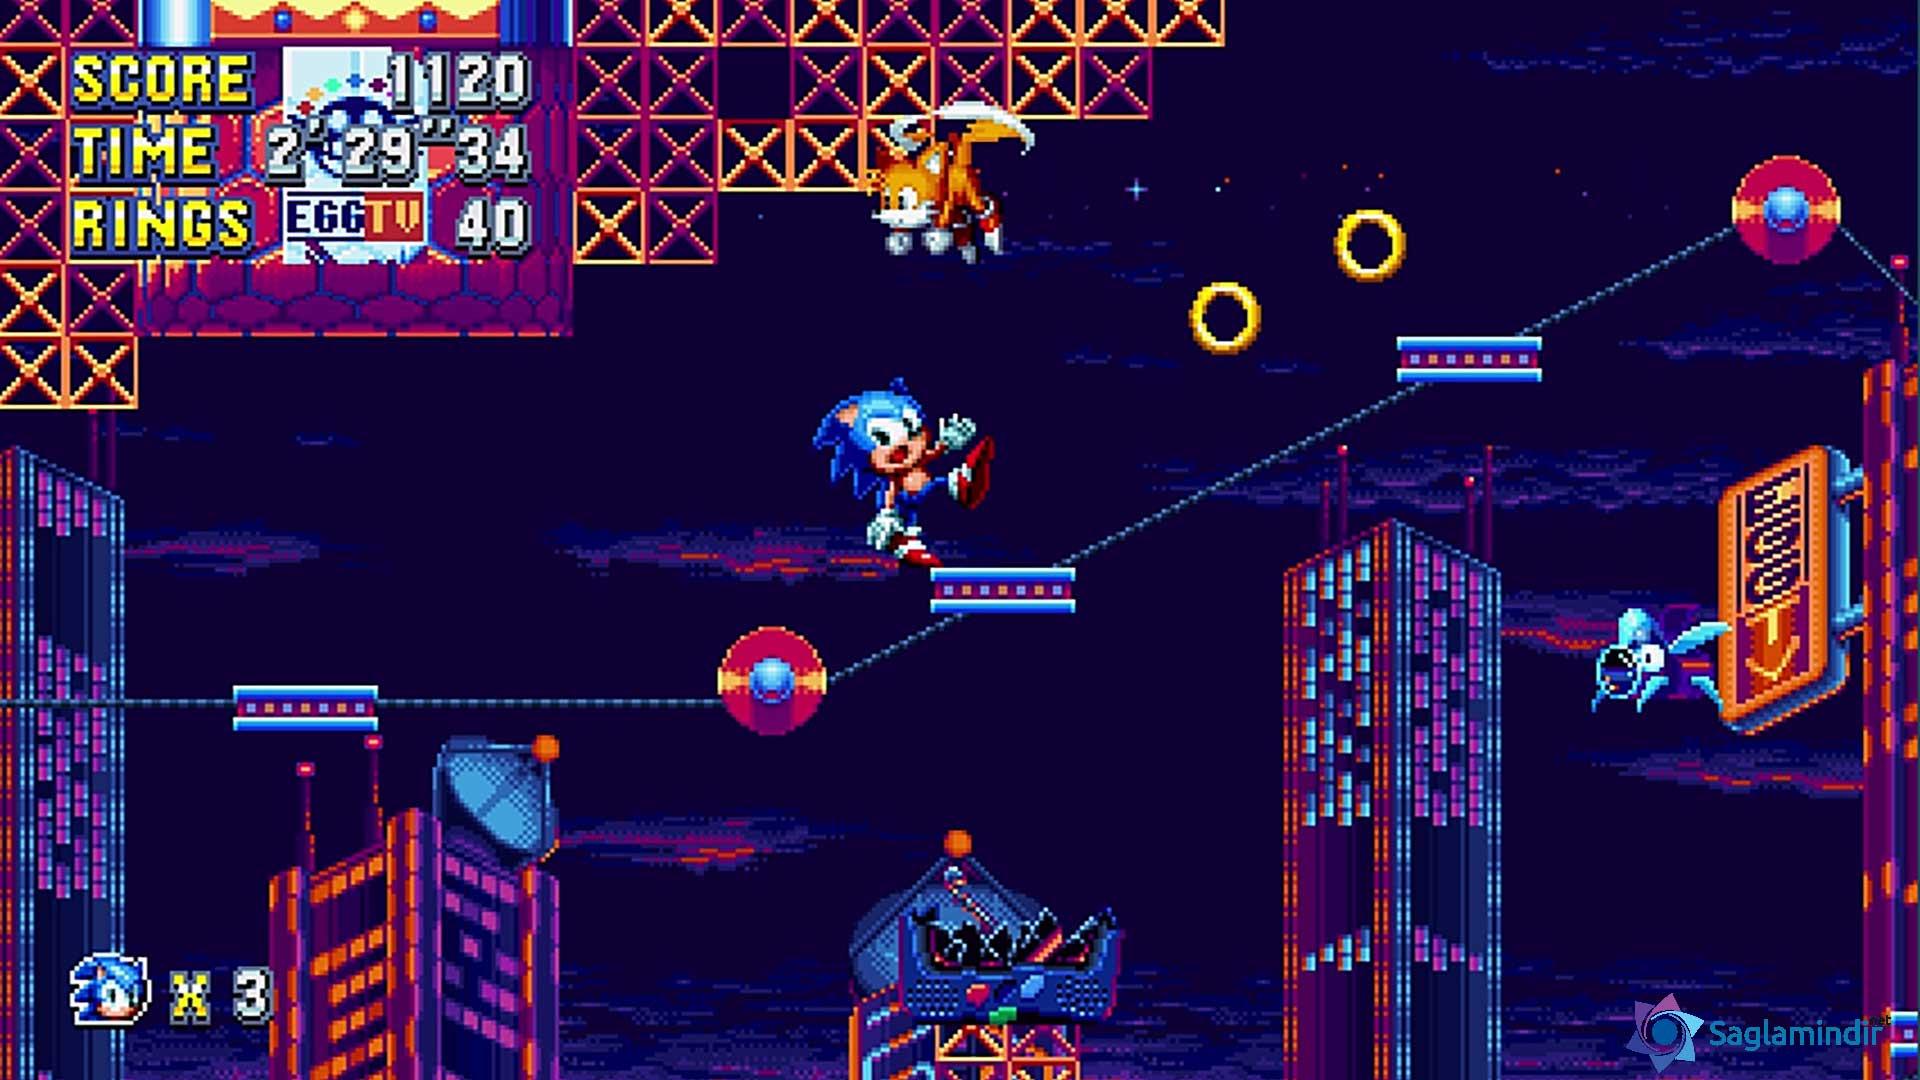 Sonic Mania saglamindir